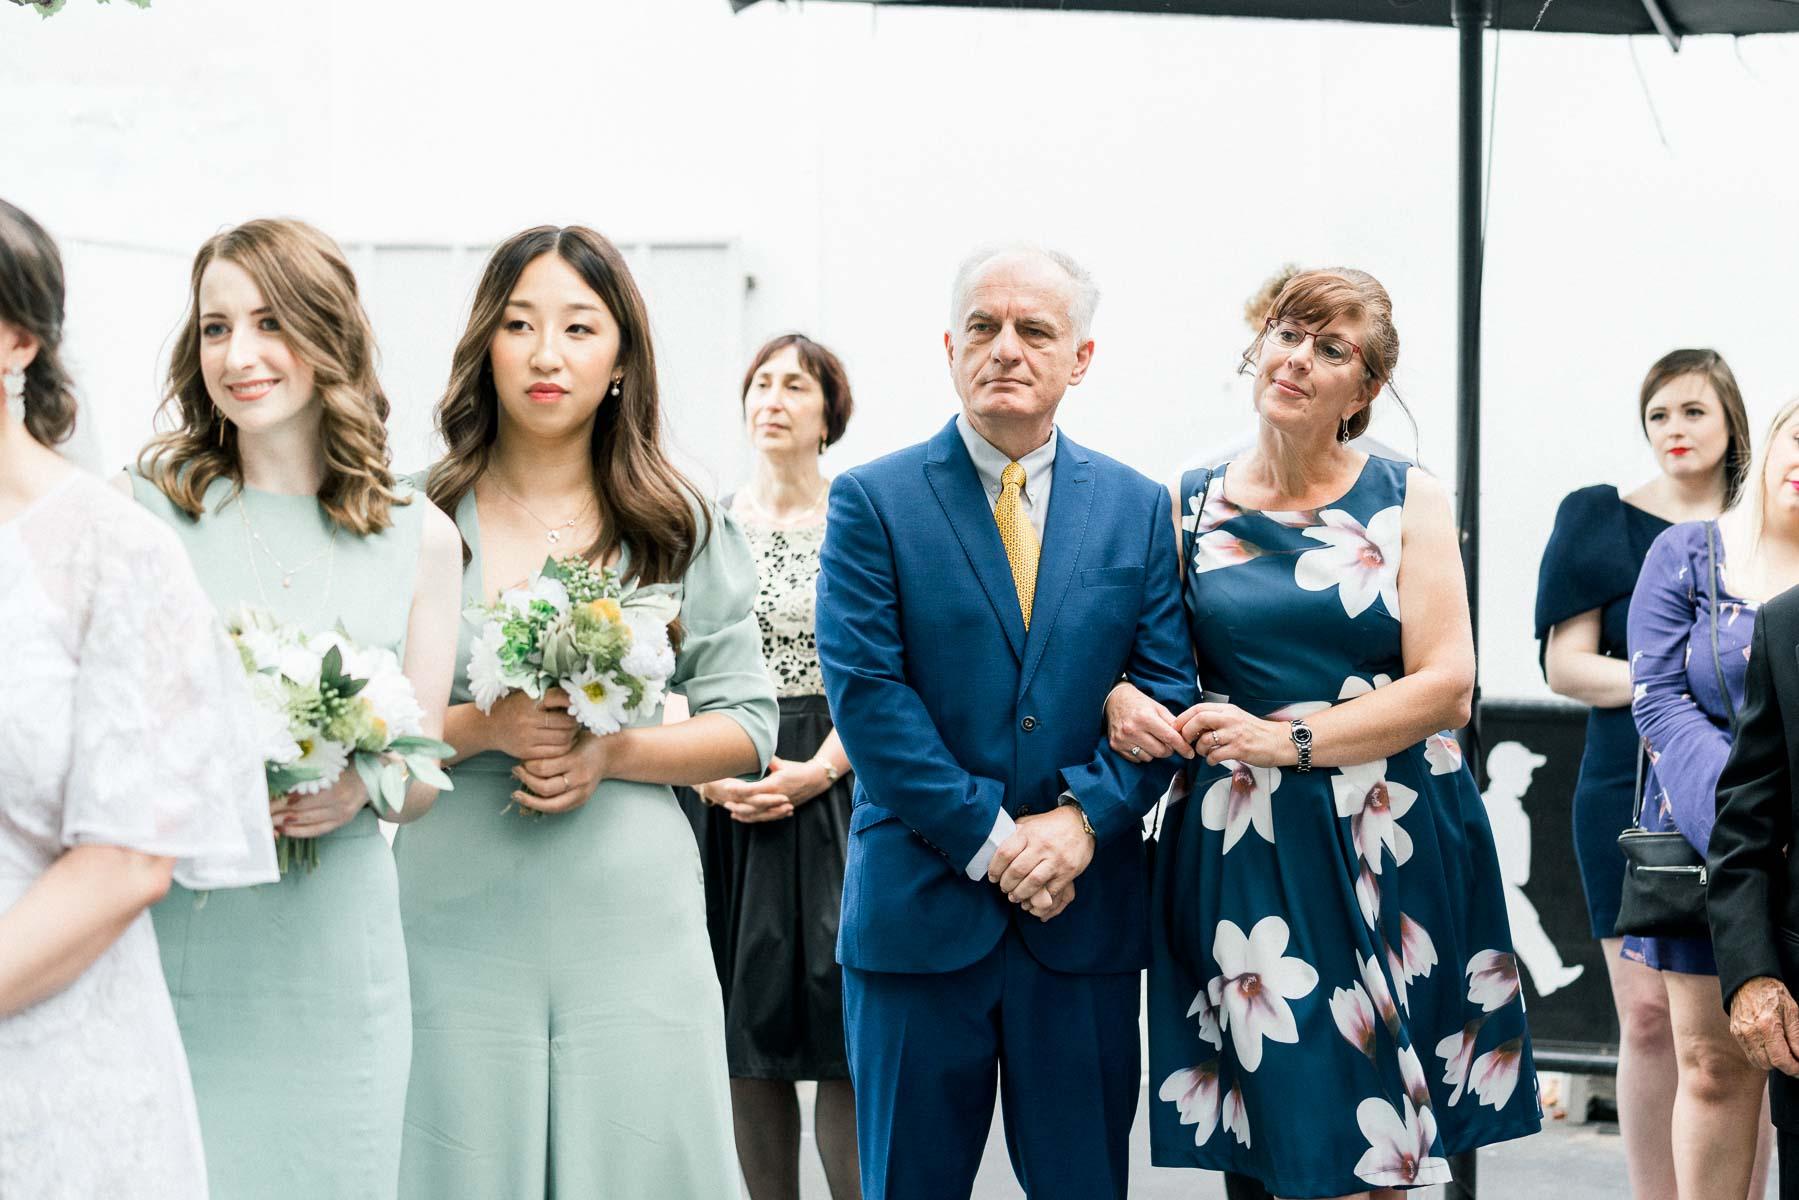 little-henri-cafe-wedding-thornbury-heart+soul-weddings-jane-aaron-05639.jpg